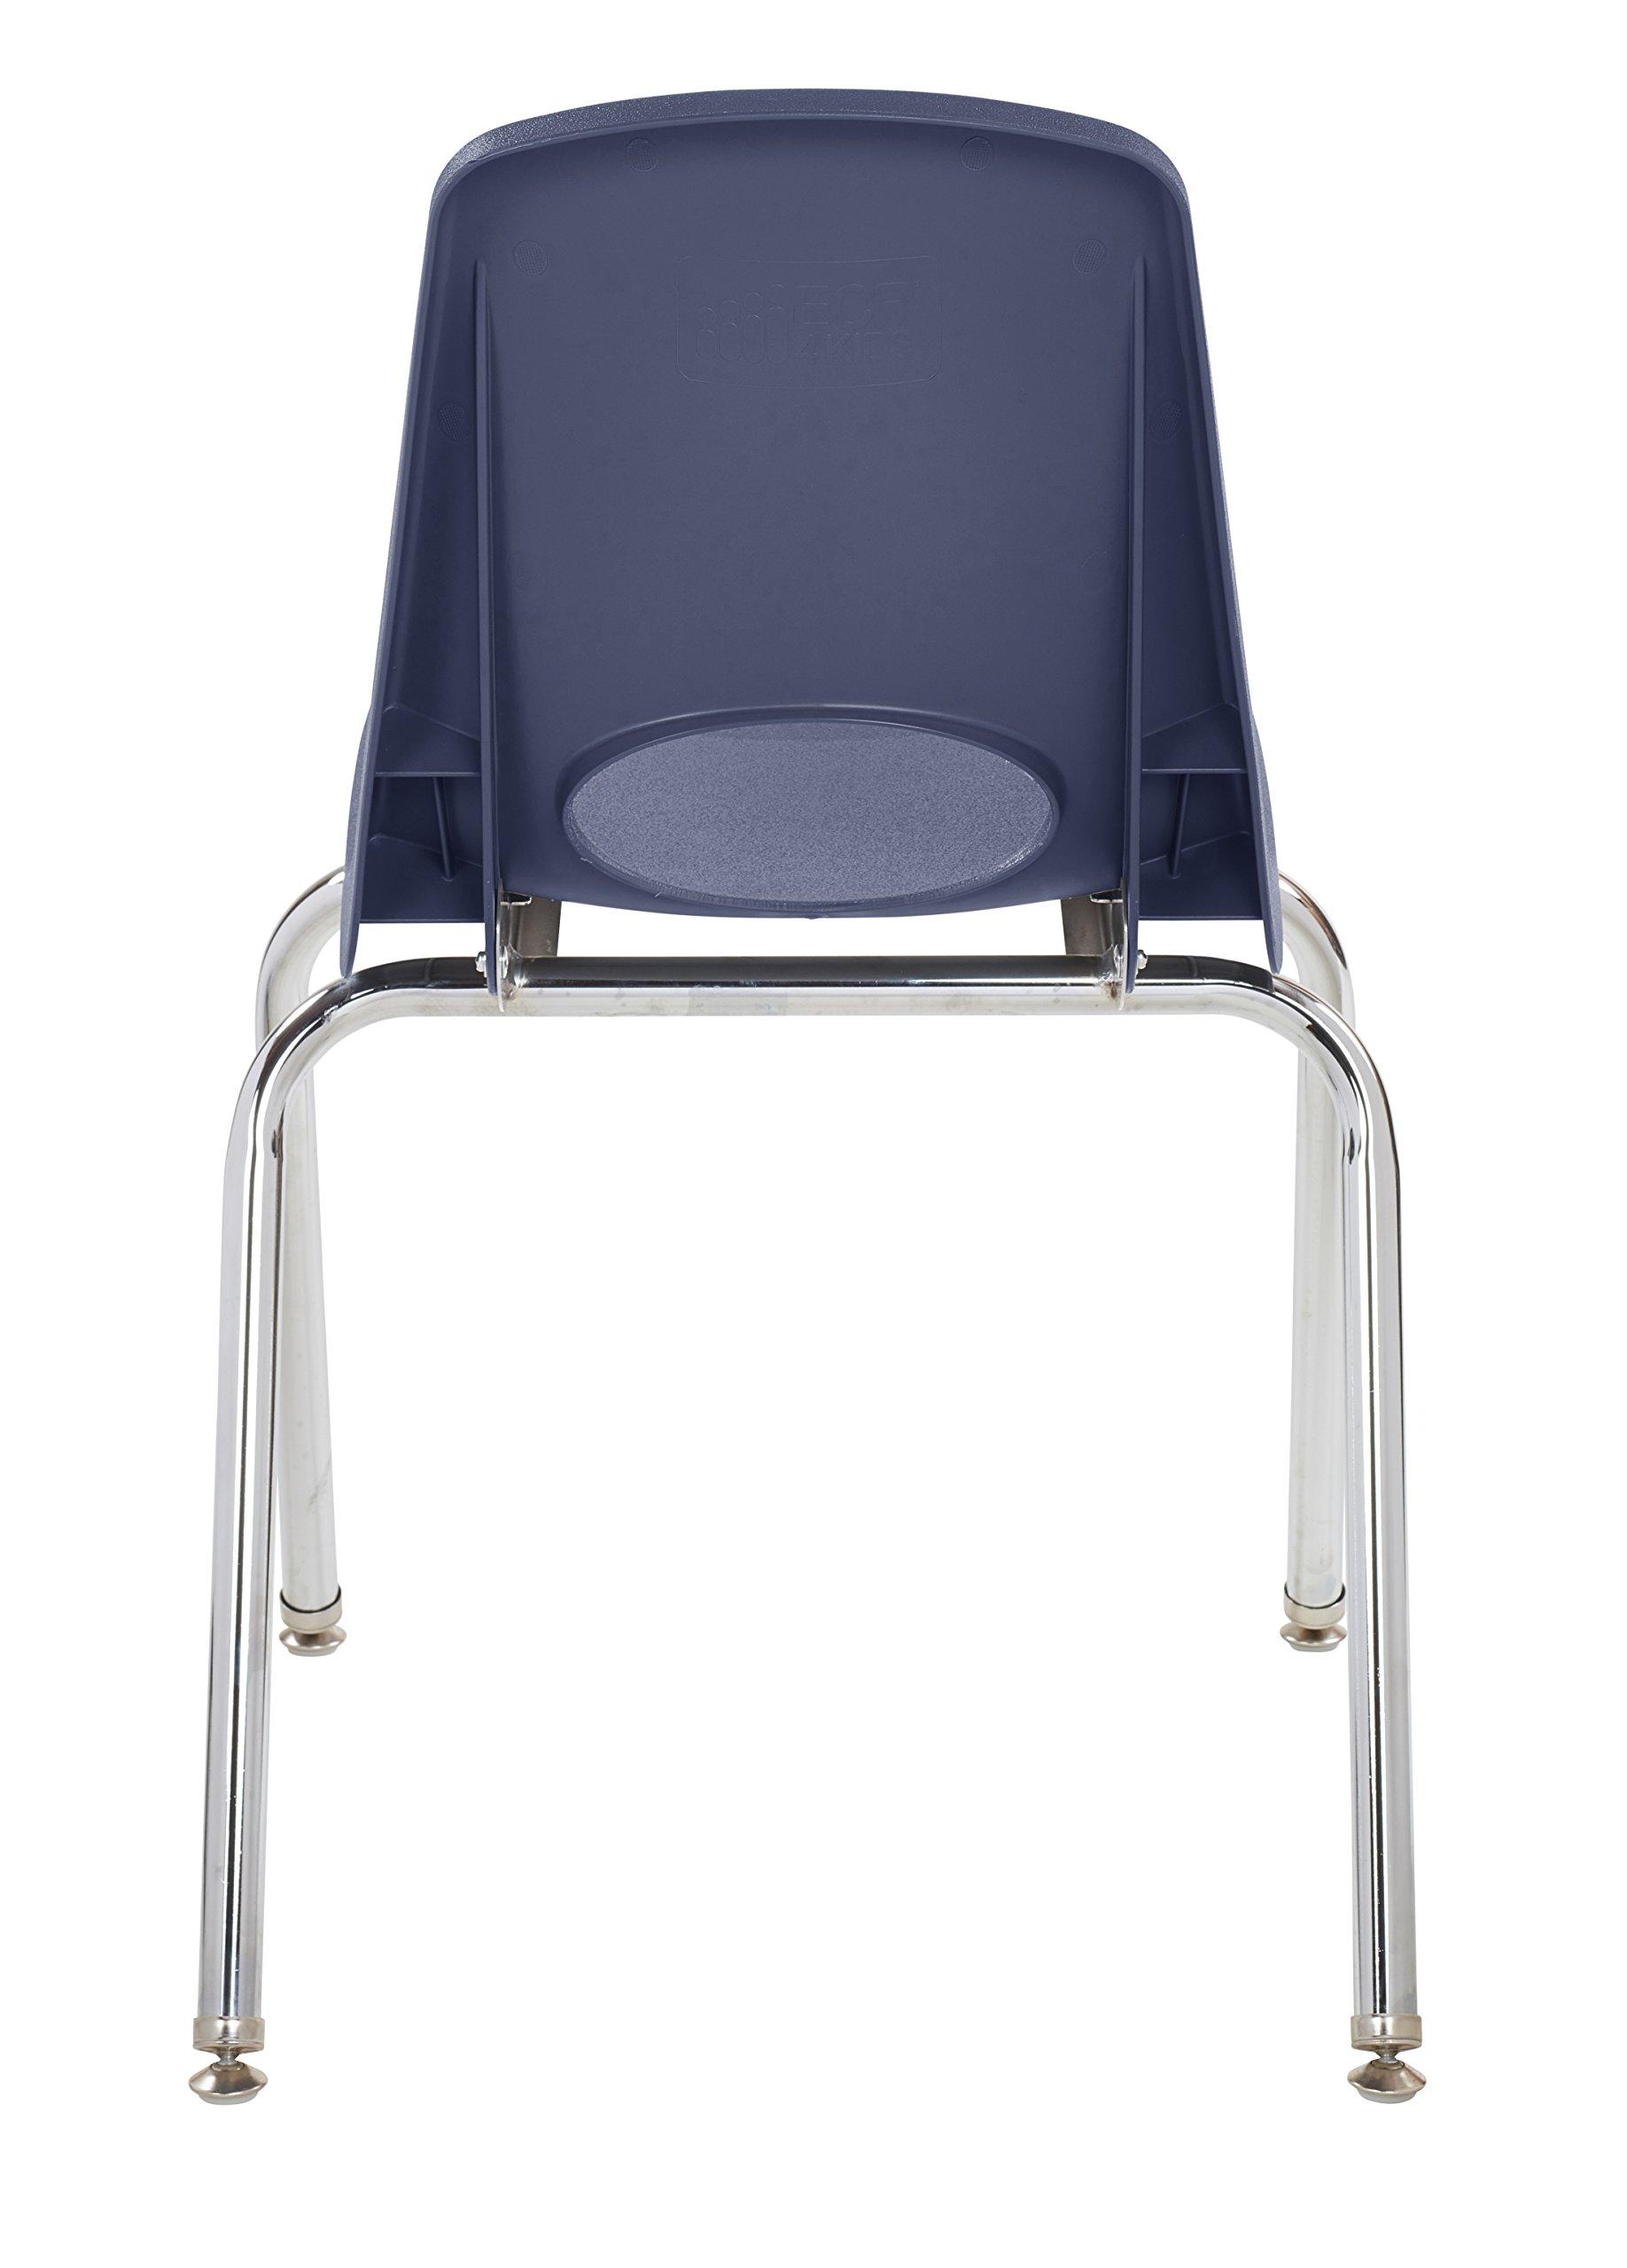 ECR4Kids 18'' School Stack Chair, Chrome Legs with Nylon Swivel Glides, Navy (5-Pack) by ECR4Kids (Image #5)